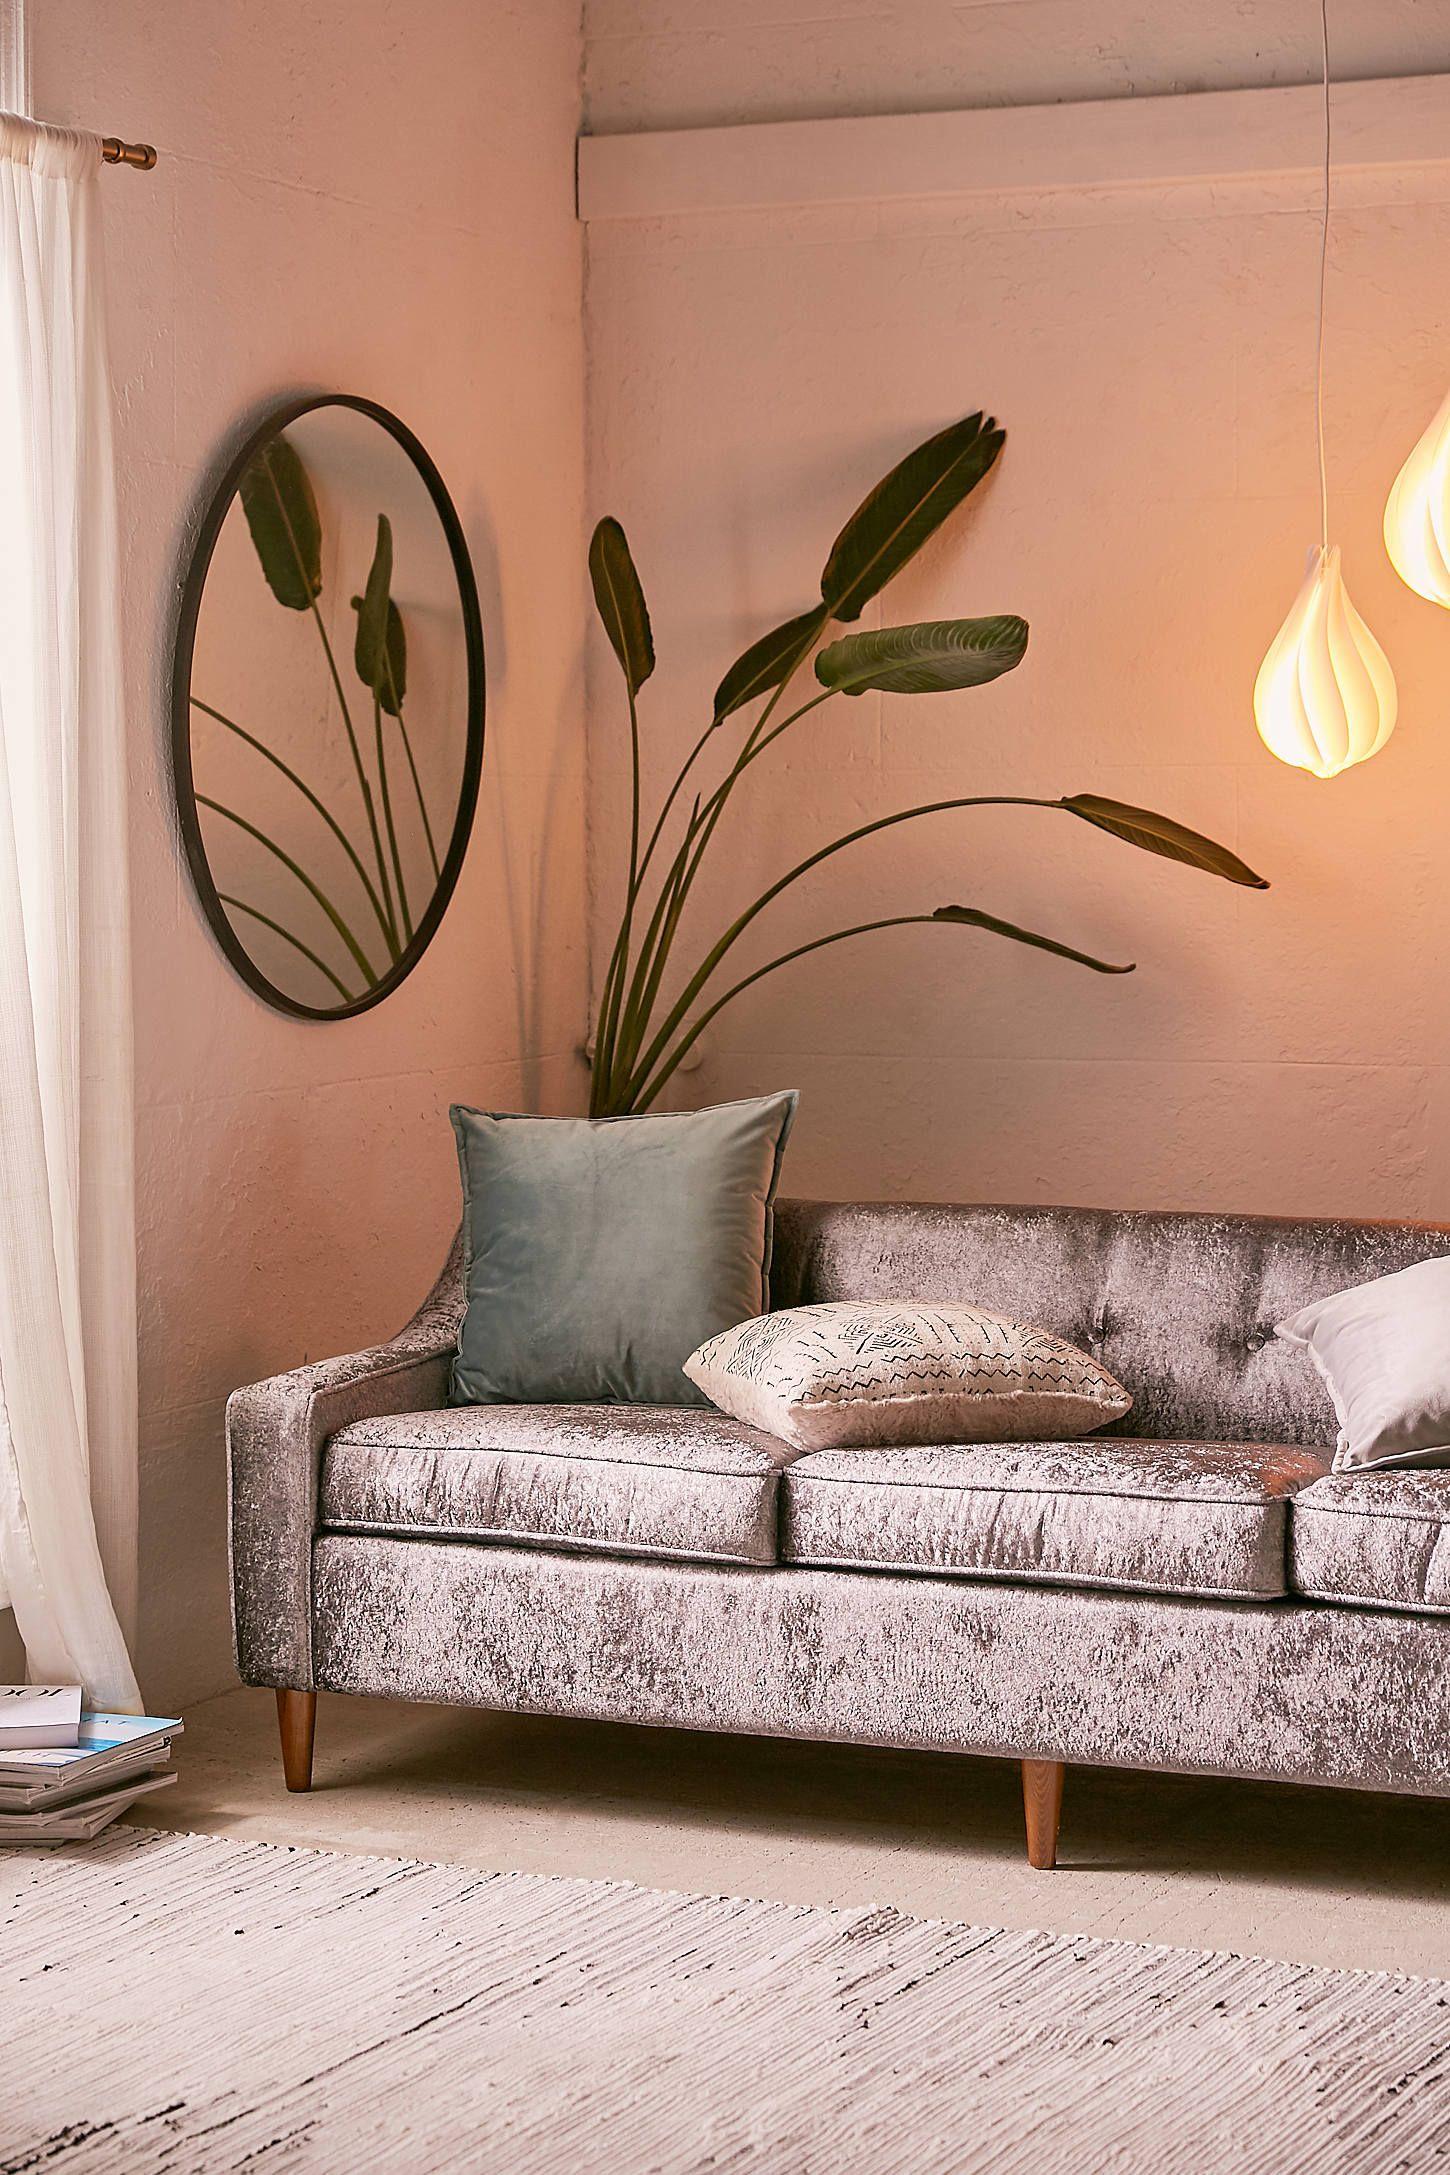 Milly Crushed Velvet Sofa | Apartment decor, Crushed ...